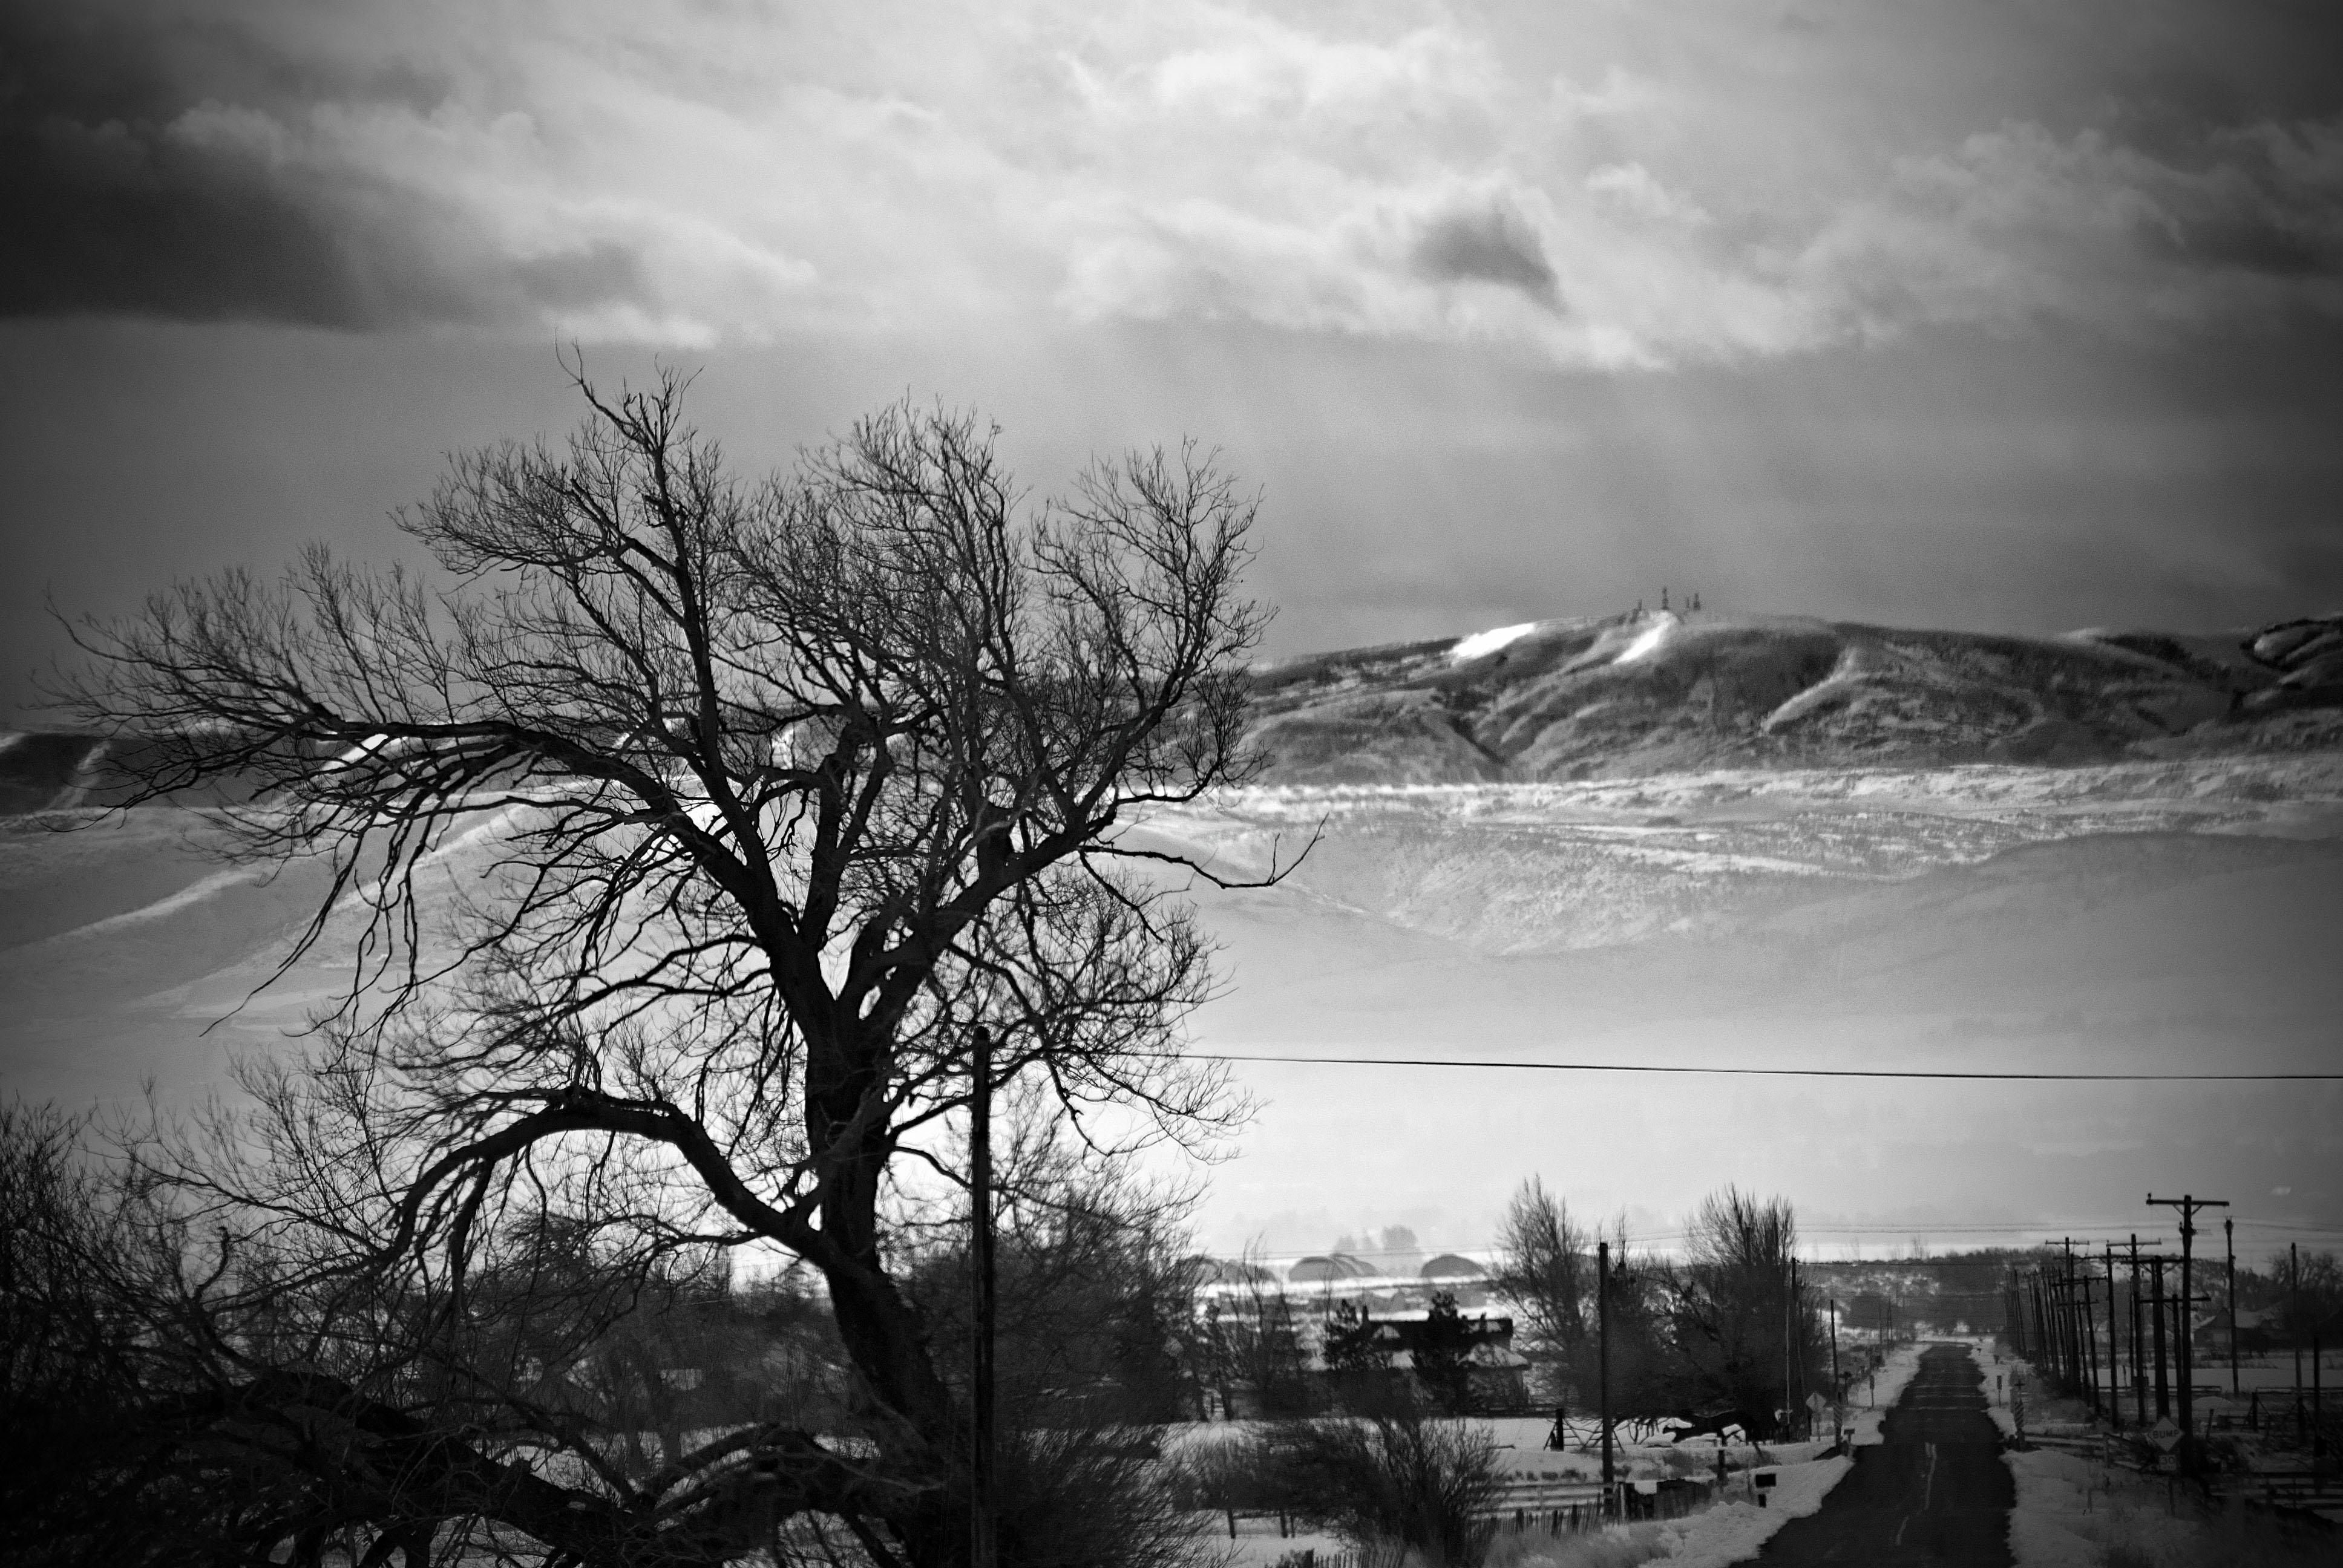 black and white photographybycjp